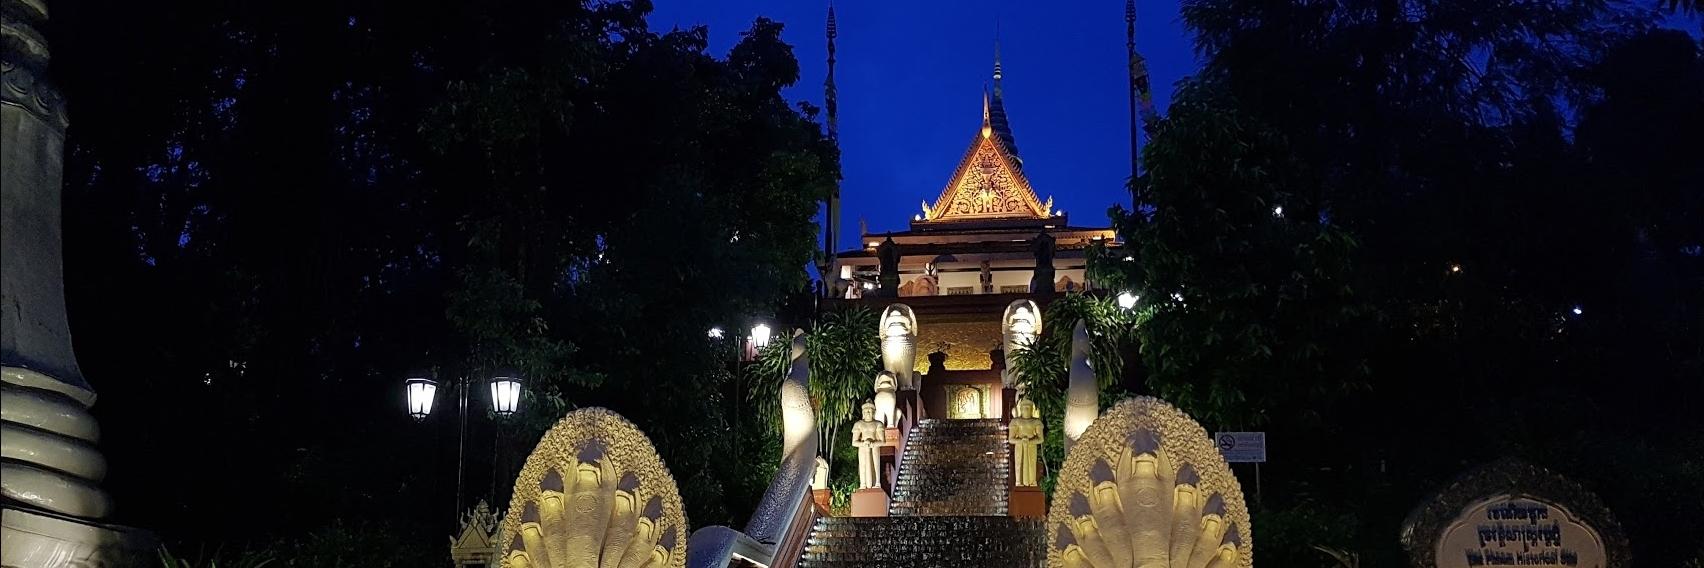 https://gody.vn/blog/neumotngayem7328/post/kham-pha-vuong-quoc-campuchia-phan-1-5122